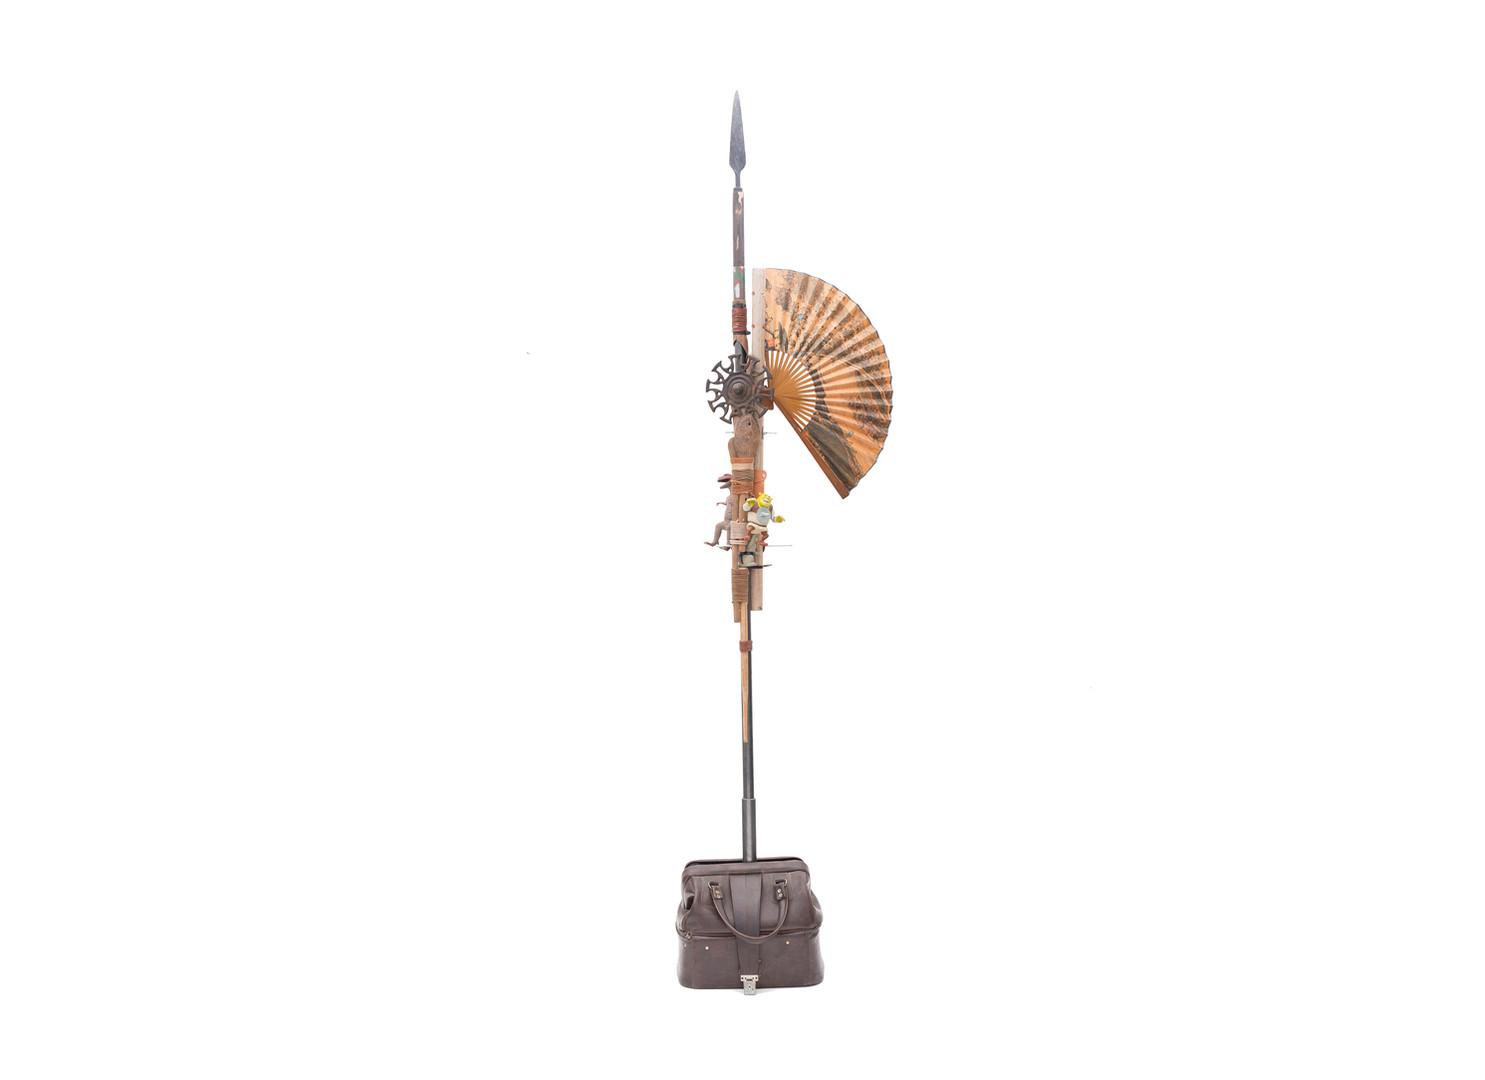 Masimba Hwati | Antenna I | 2017 | Mixed Media | 240 x 23 x 40 cm